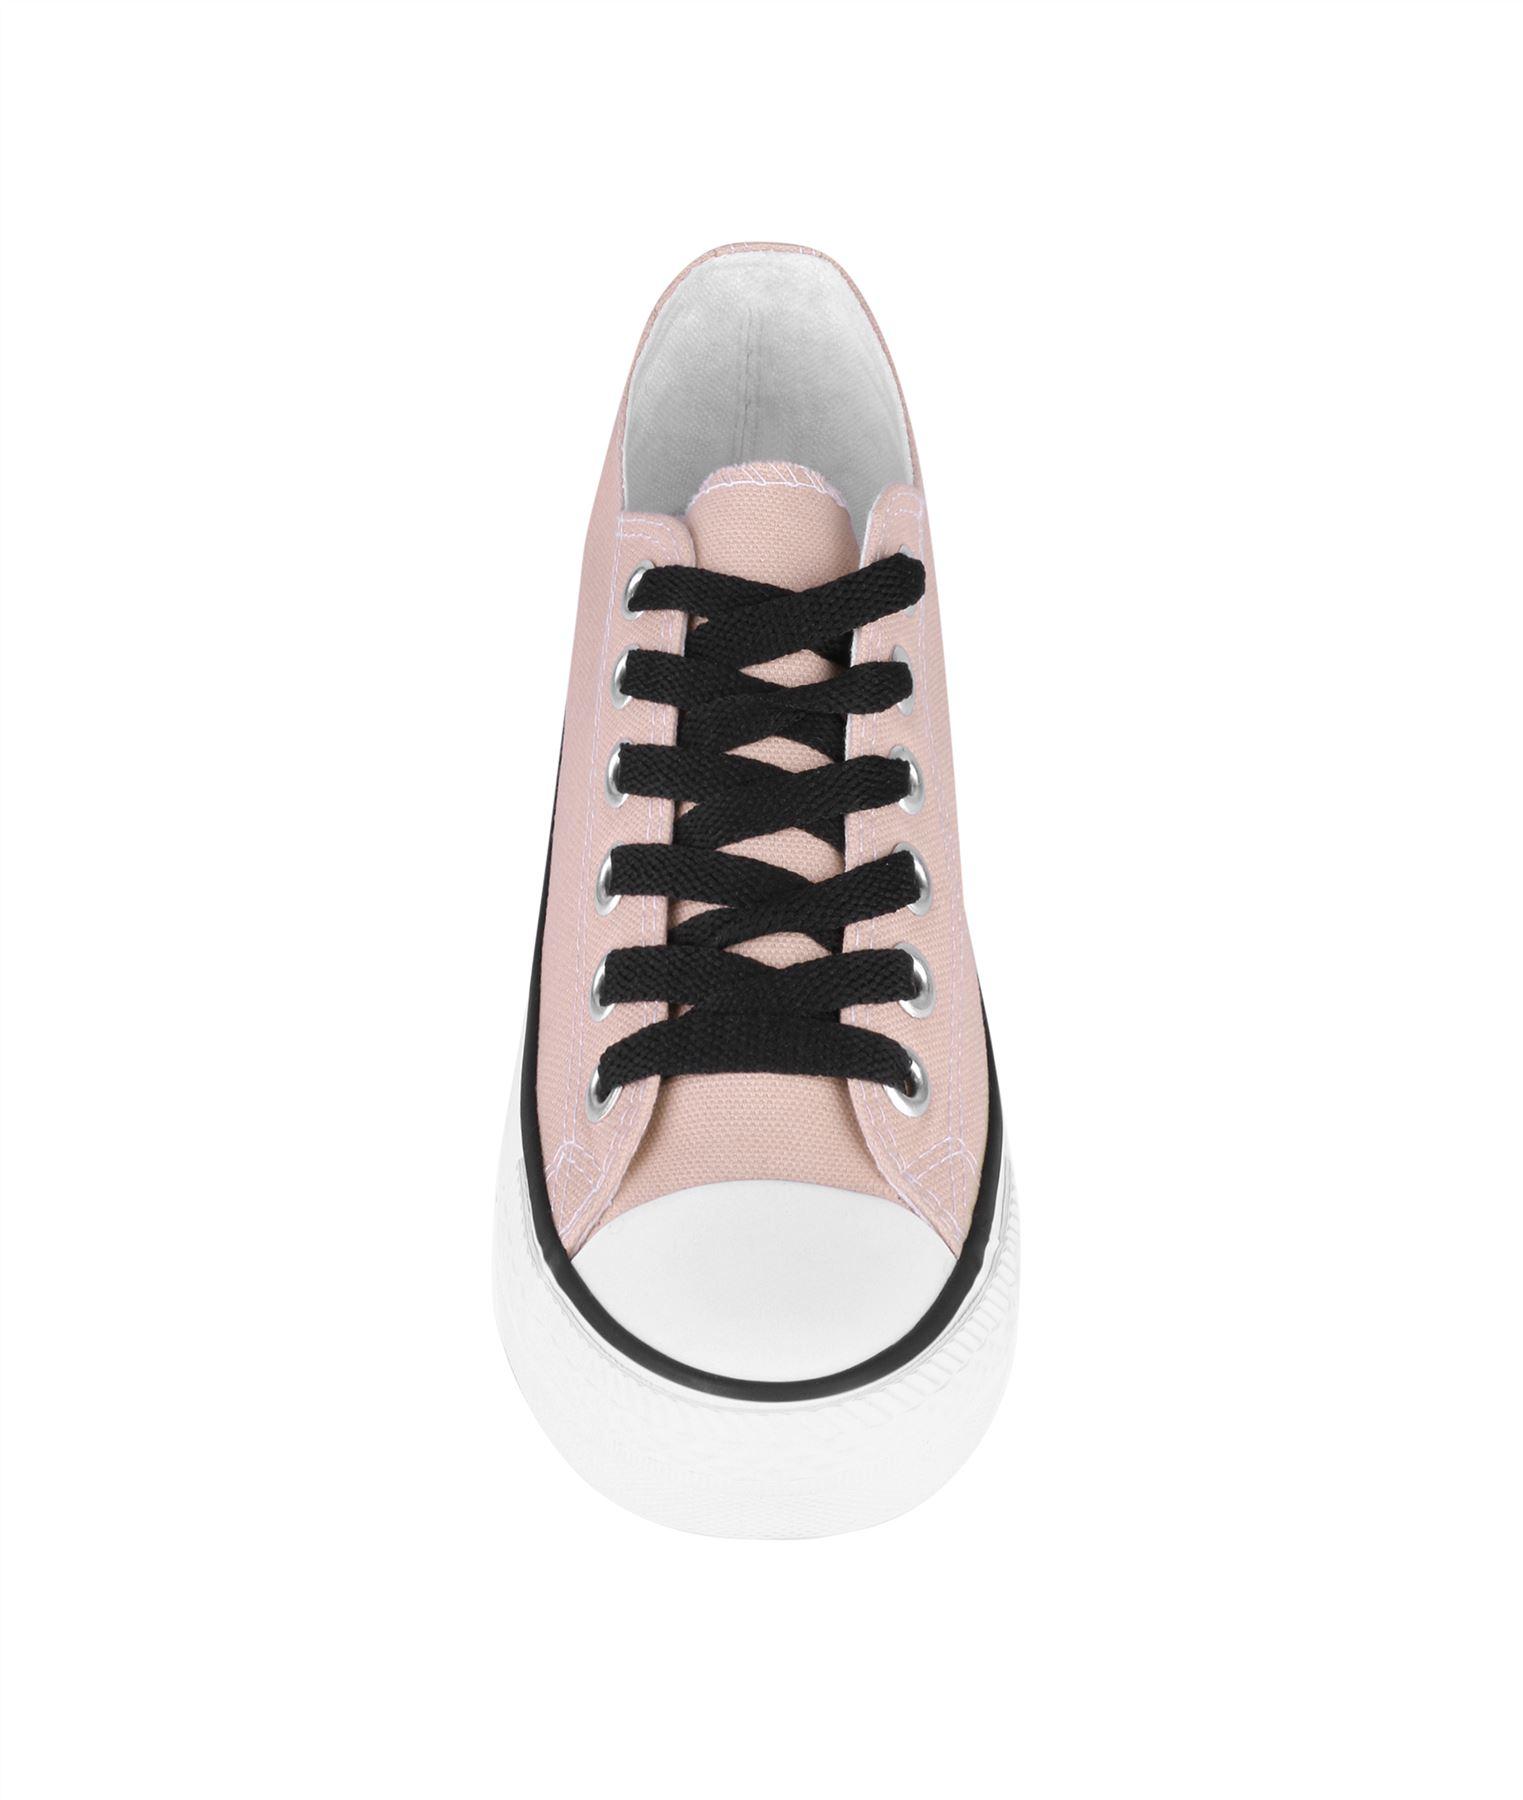 Zapatillas-Mujer-Casuales-Deportiva-Barata-Lona-Moda-Originales-Outlet-Tela-Moda miniatura 48